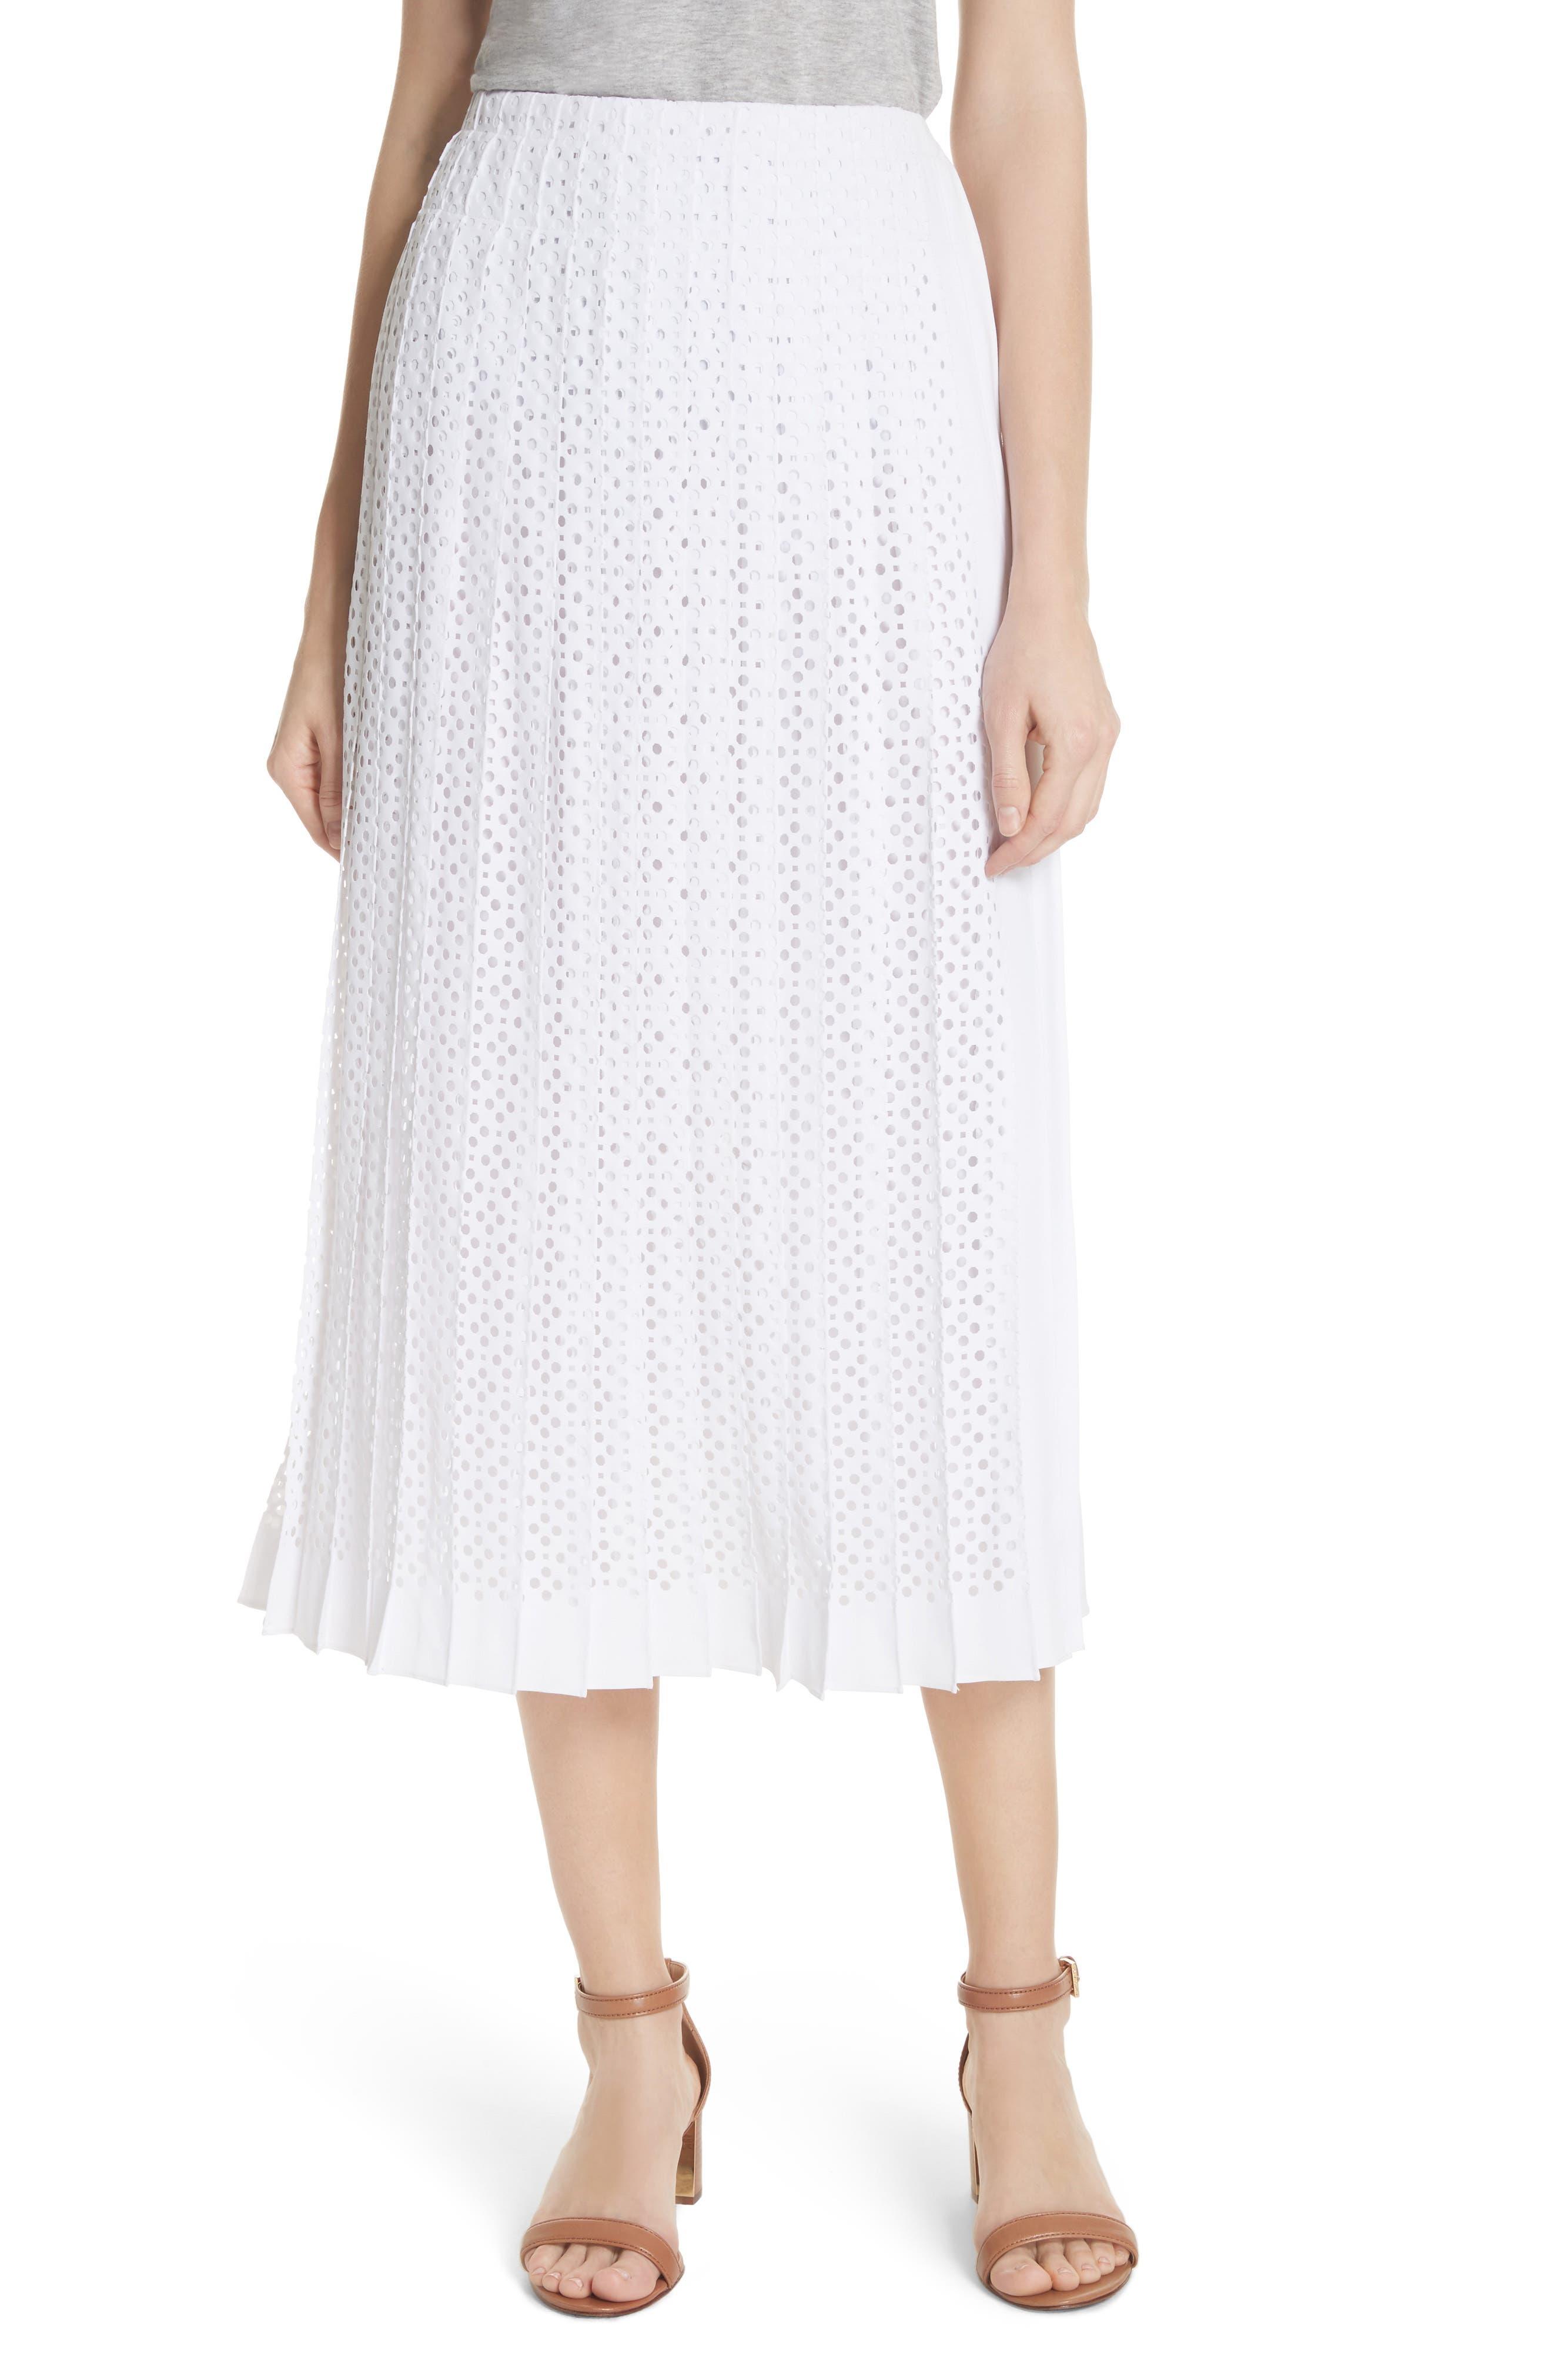 TORY BURCH Carine Eyelet Midi Skirt, Main, color, 100